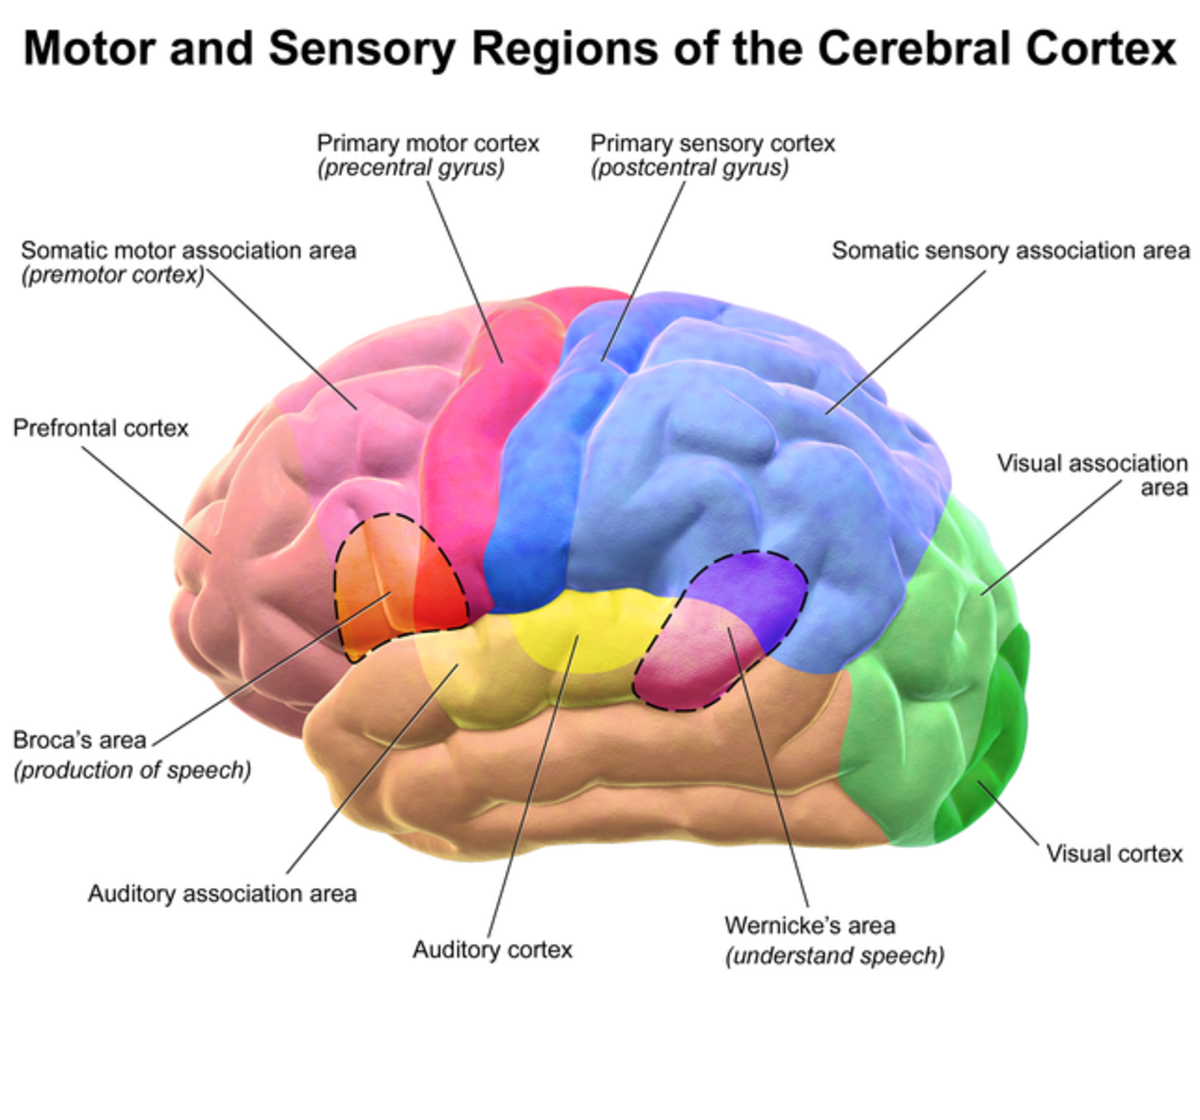 This illustration shows colour-coded lobes of the cerebral cortex. Pink = frontal lobe, blue = parietal lobe, orange = temporal lobe, green = occipital lobe